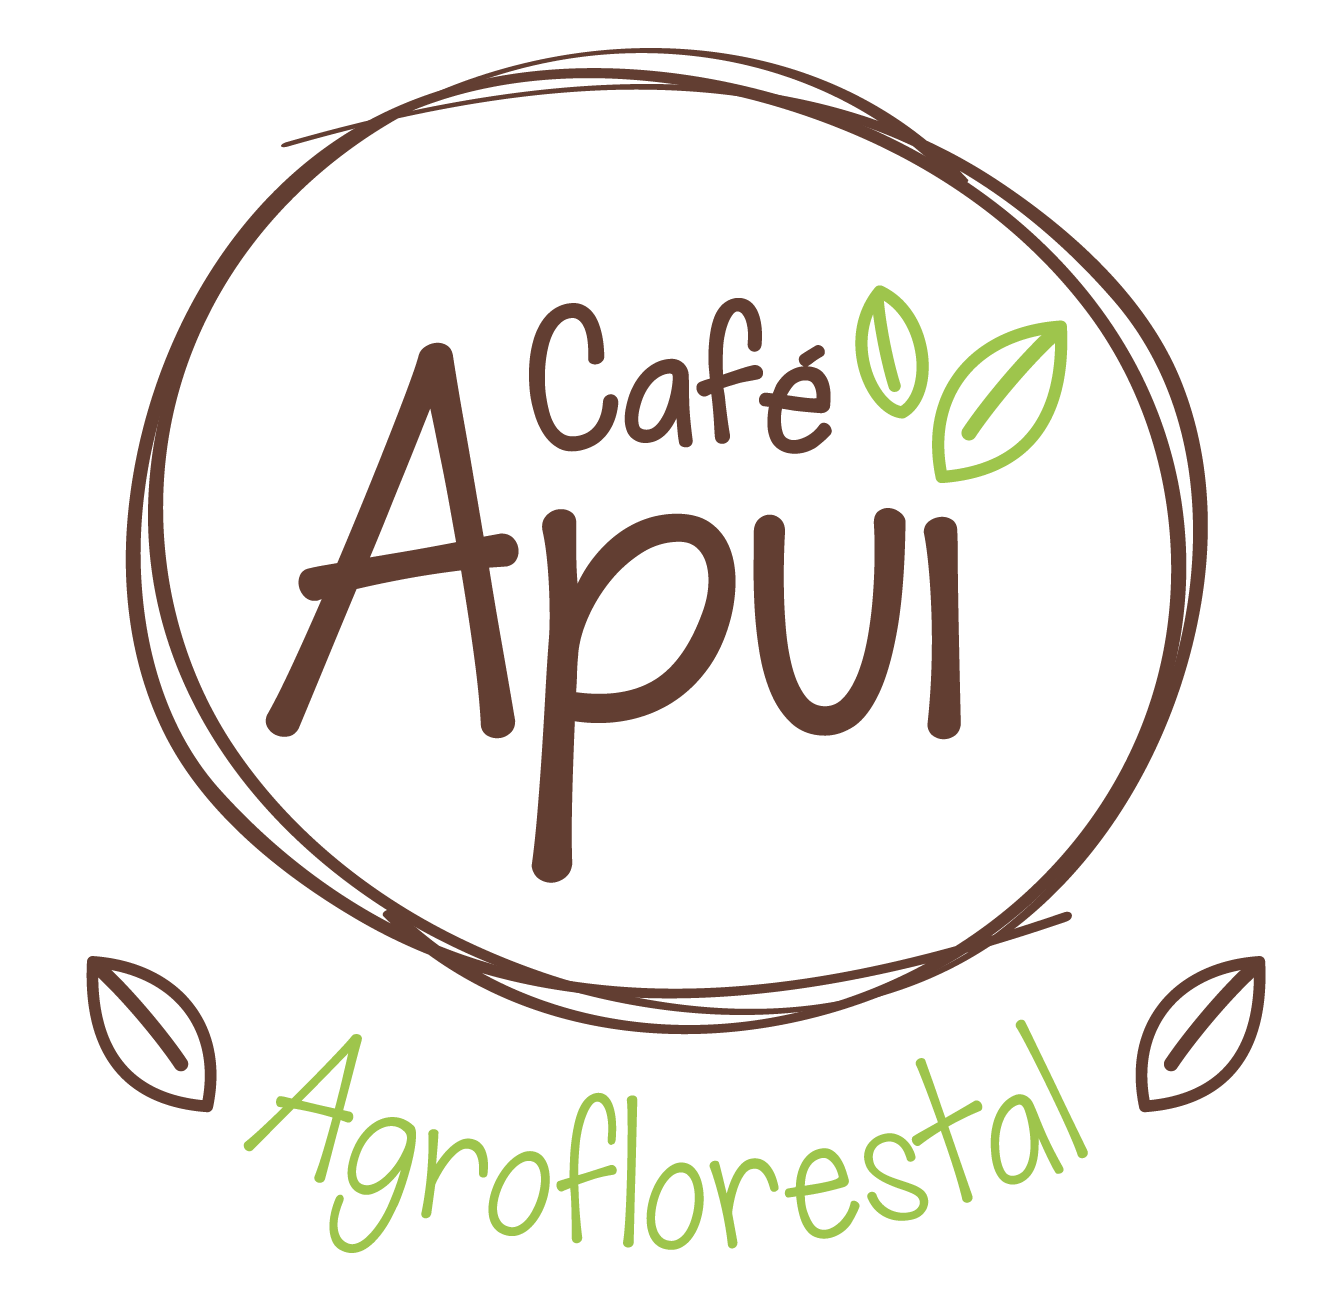 CAFÉ APUÍ AGROFLORESTAL